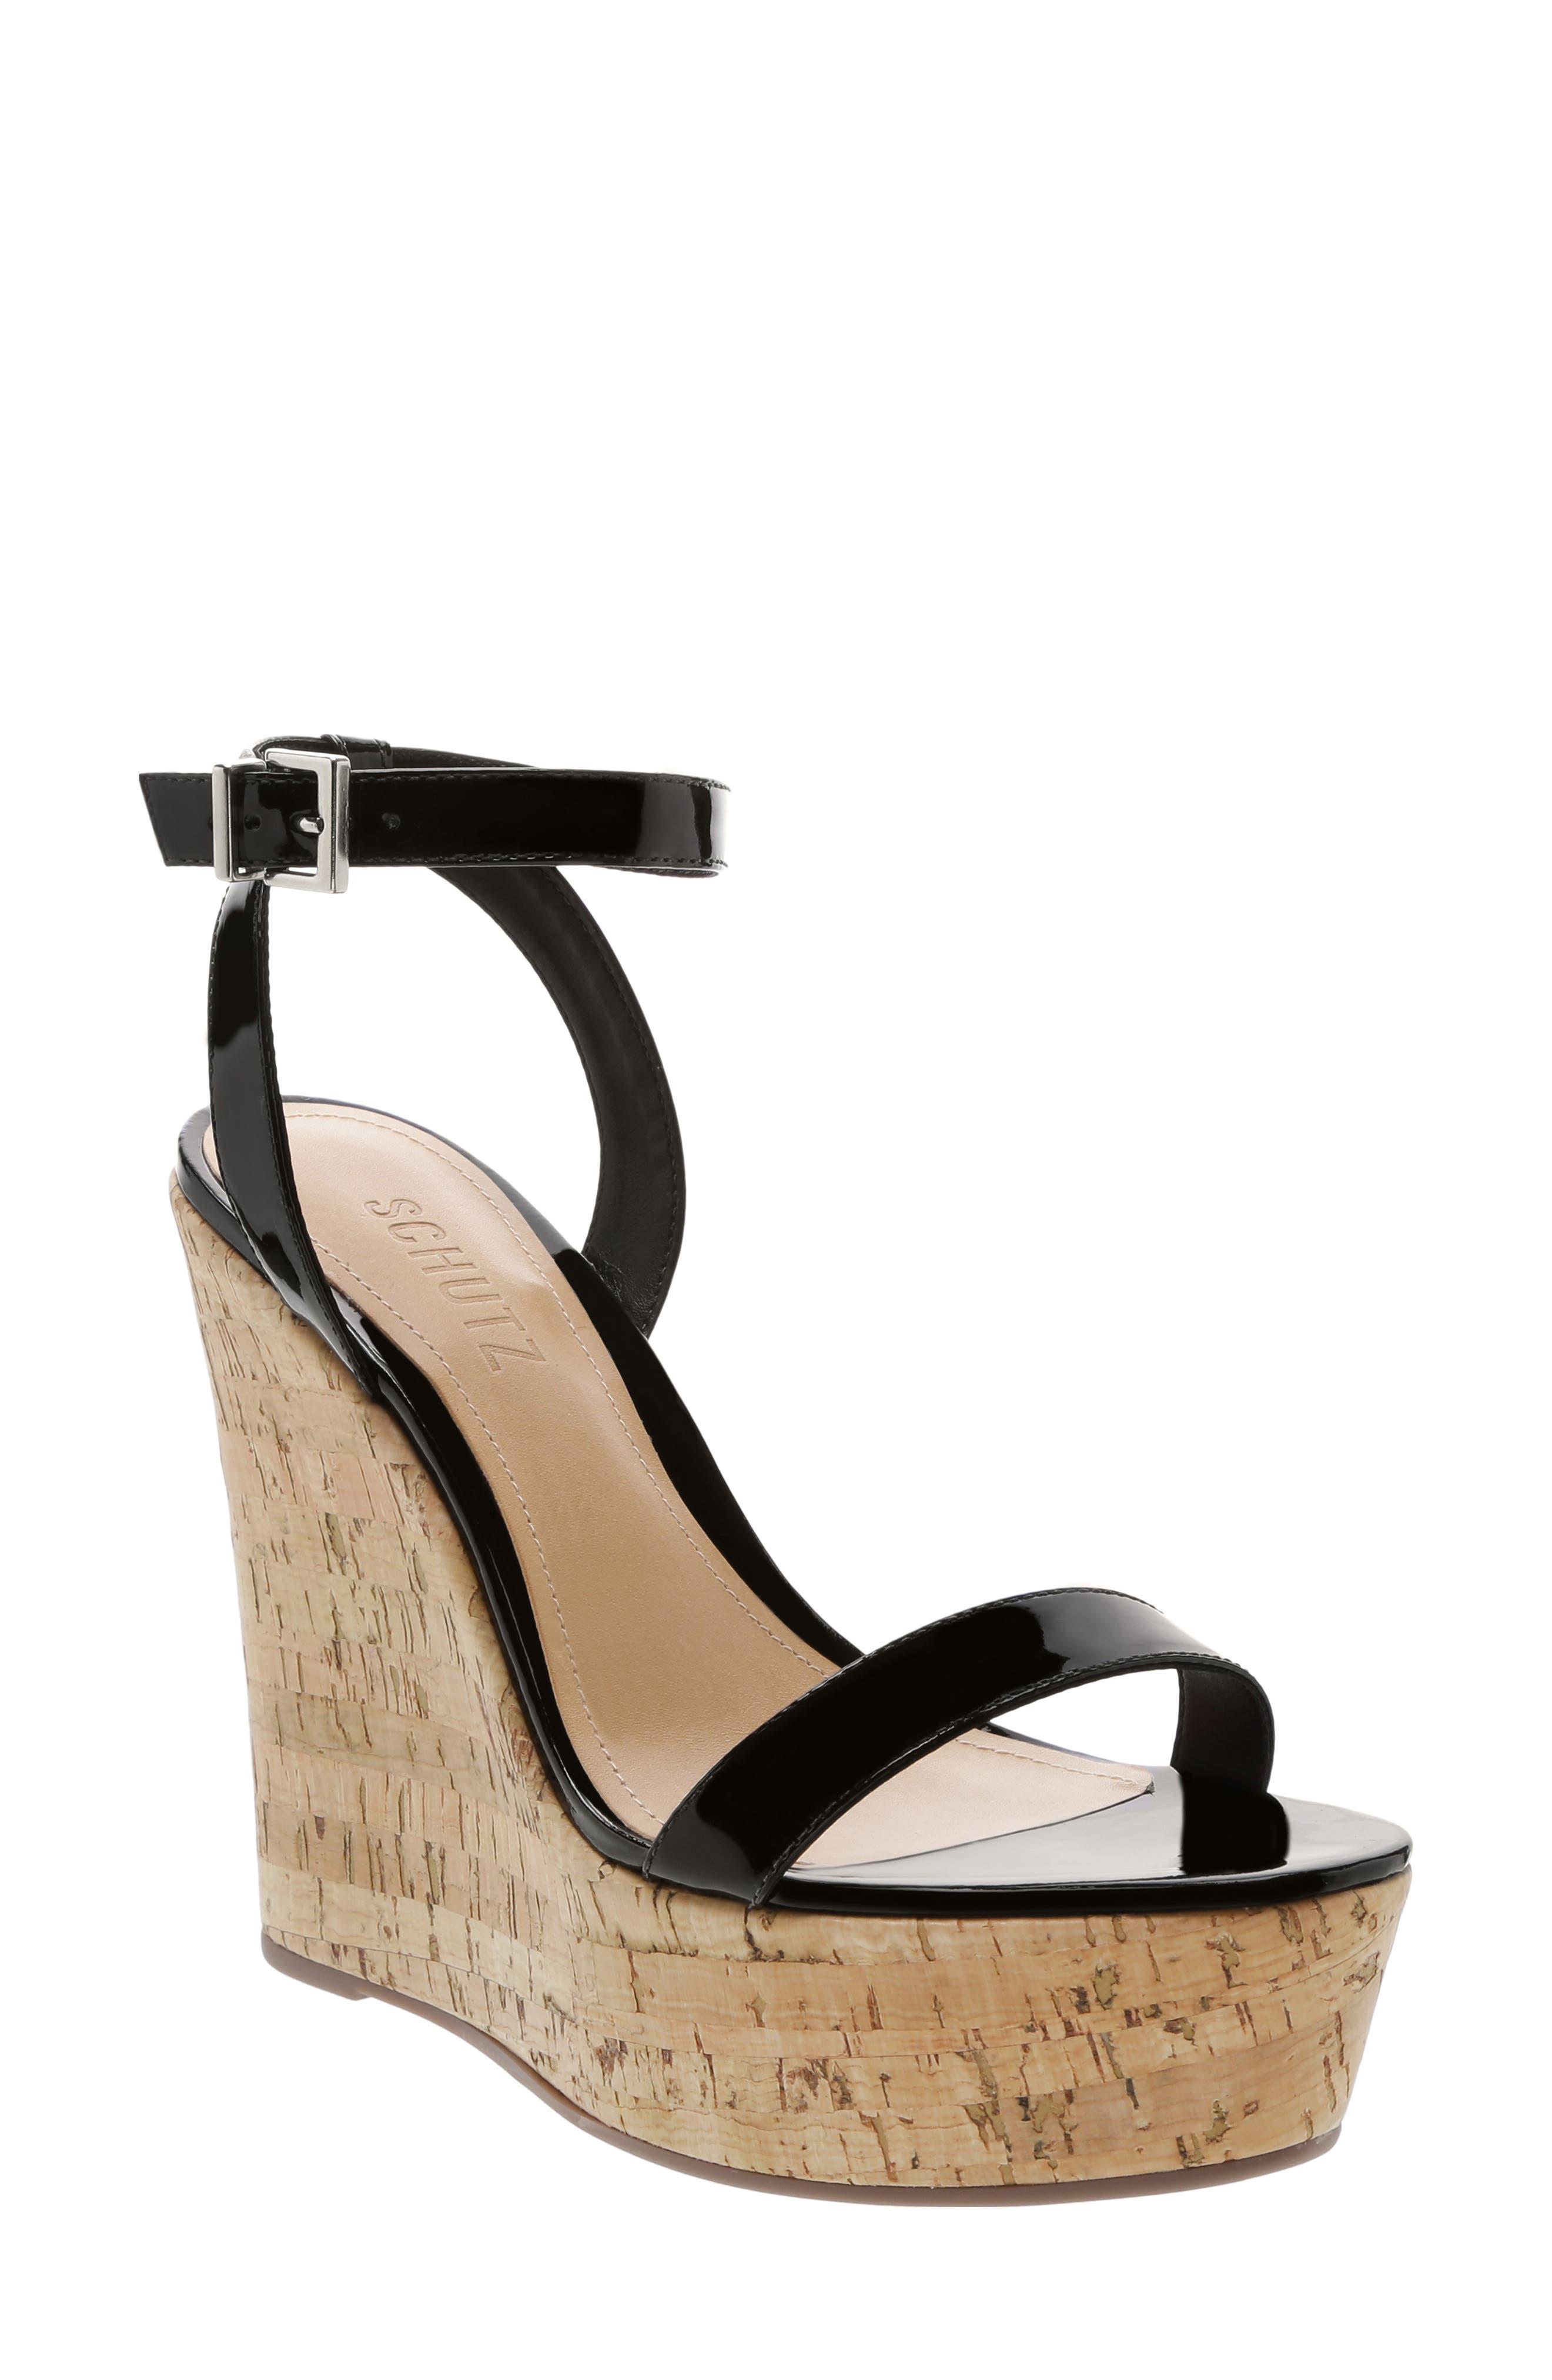 Eduarda Platform Wedge Sandal by Schutz